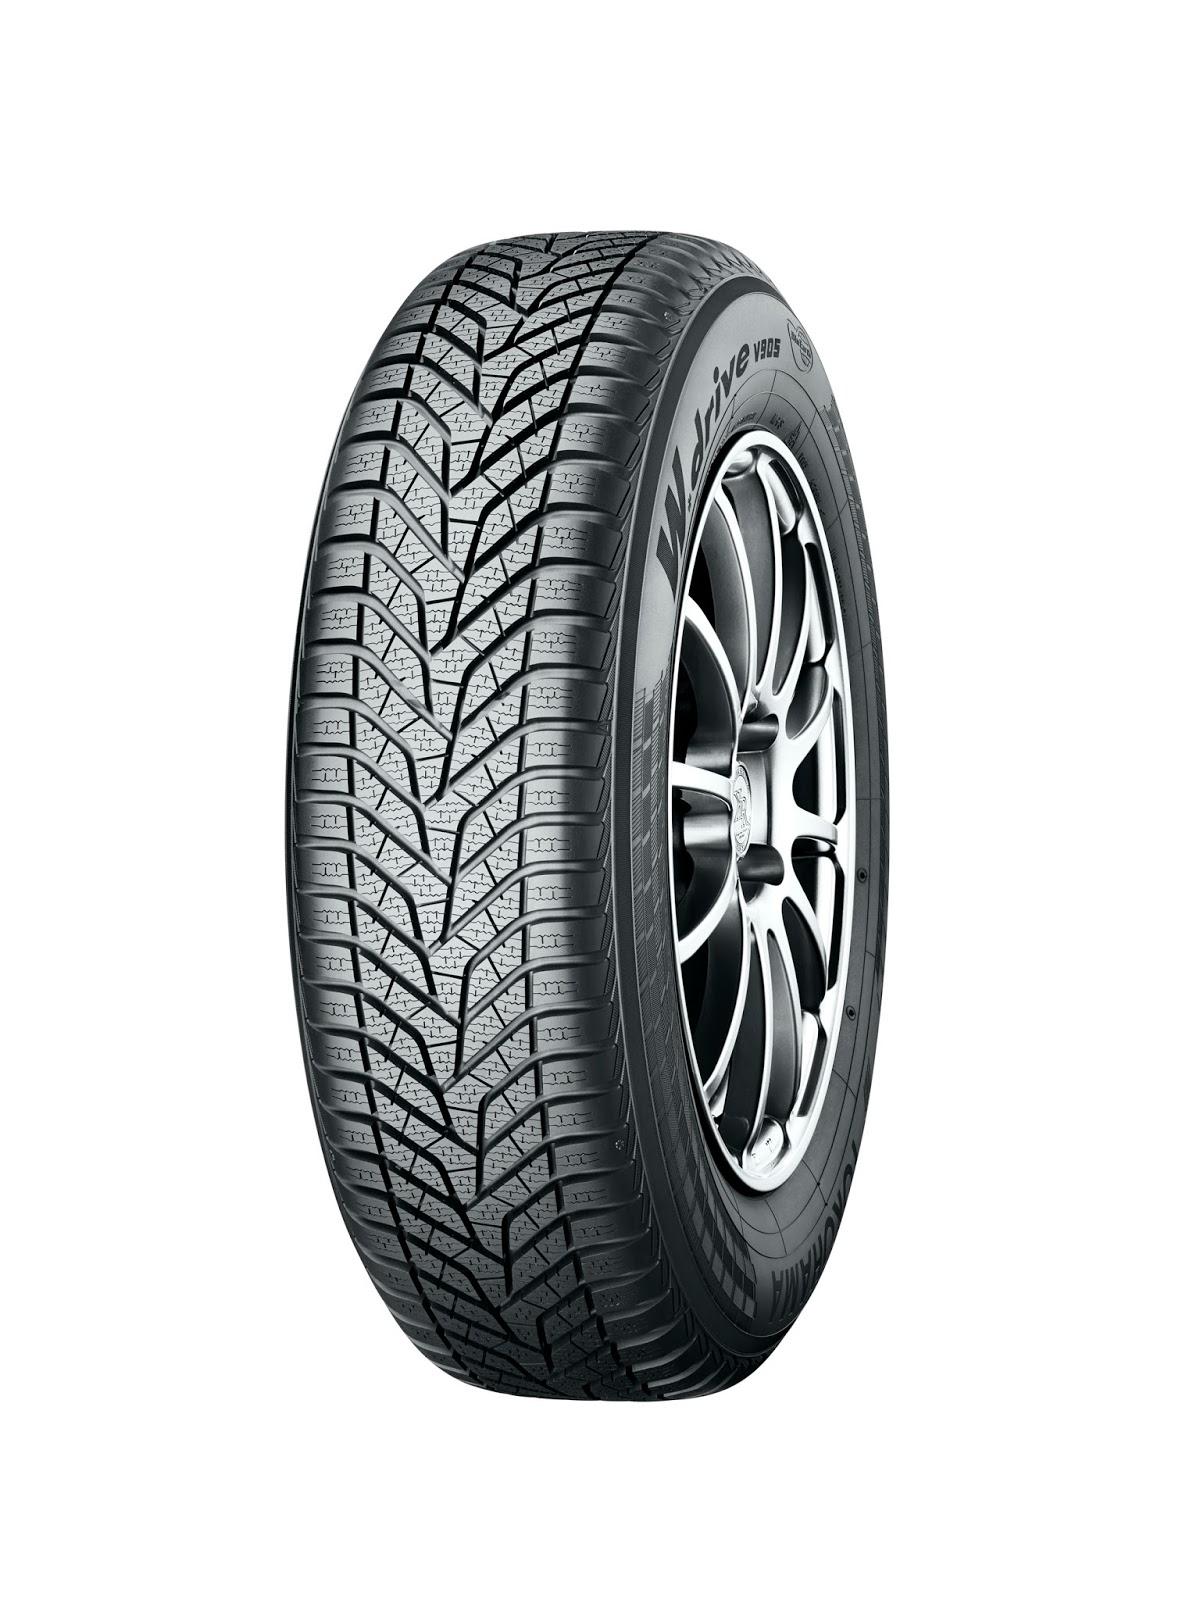 Wdrive V905 angled Σε δοκιμές του οργανισμού ADAC το χειμερινό ελαστικό W. Drive V905 της YOKOHAMA πέτυχε κορυφαίες επιδόσεις tires, YOKOHAMA, Ελαστικά